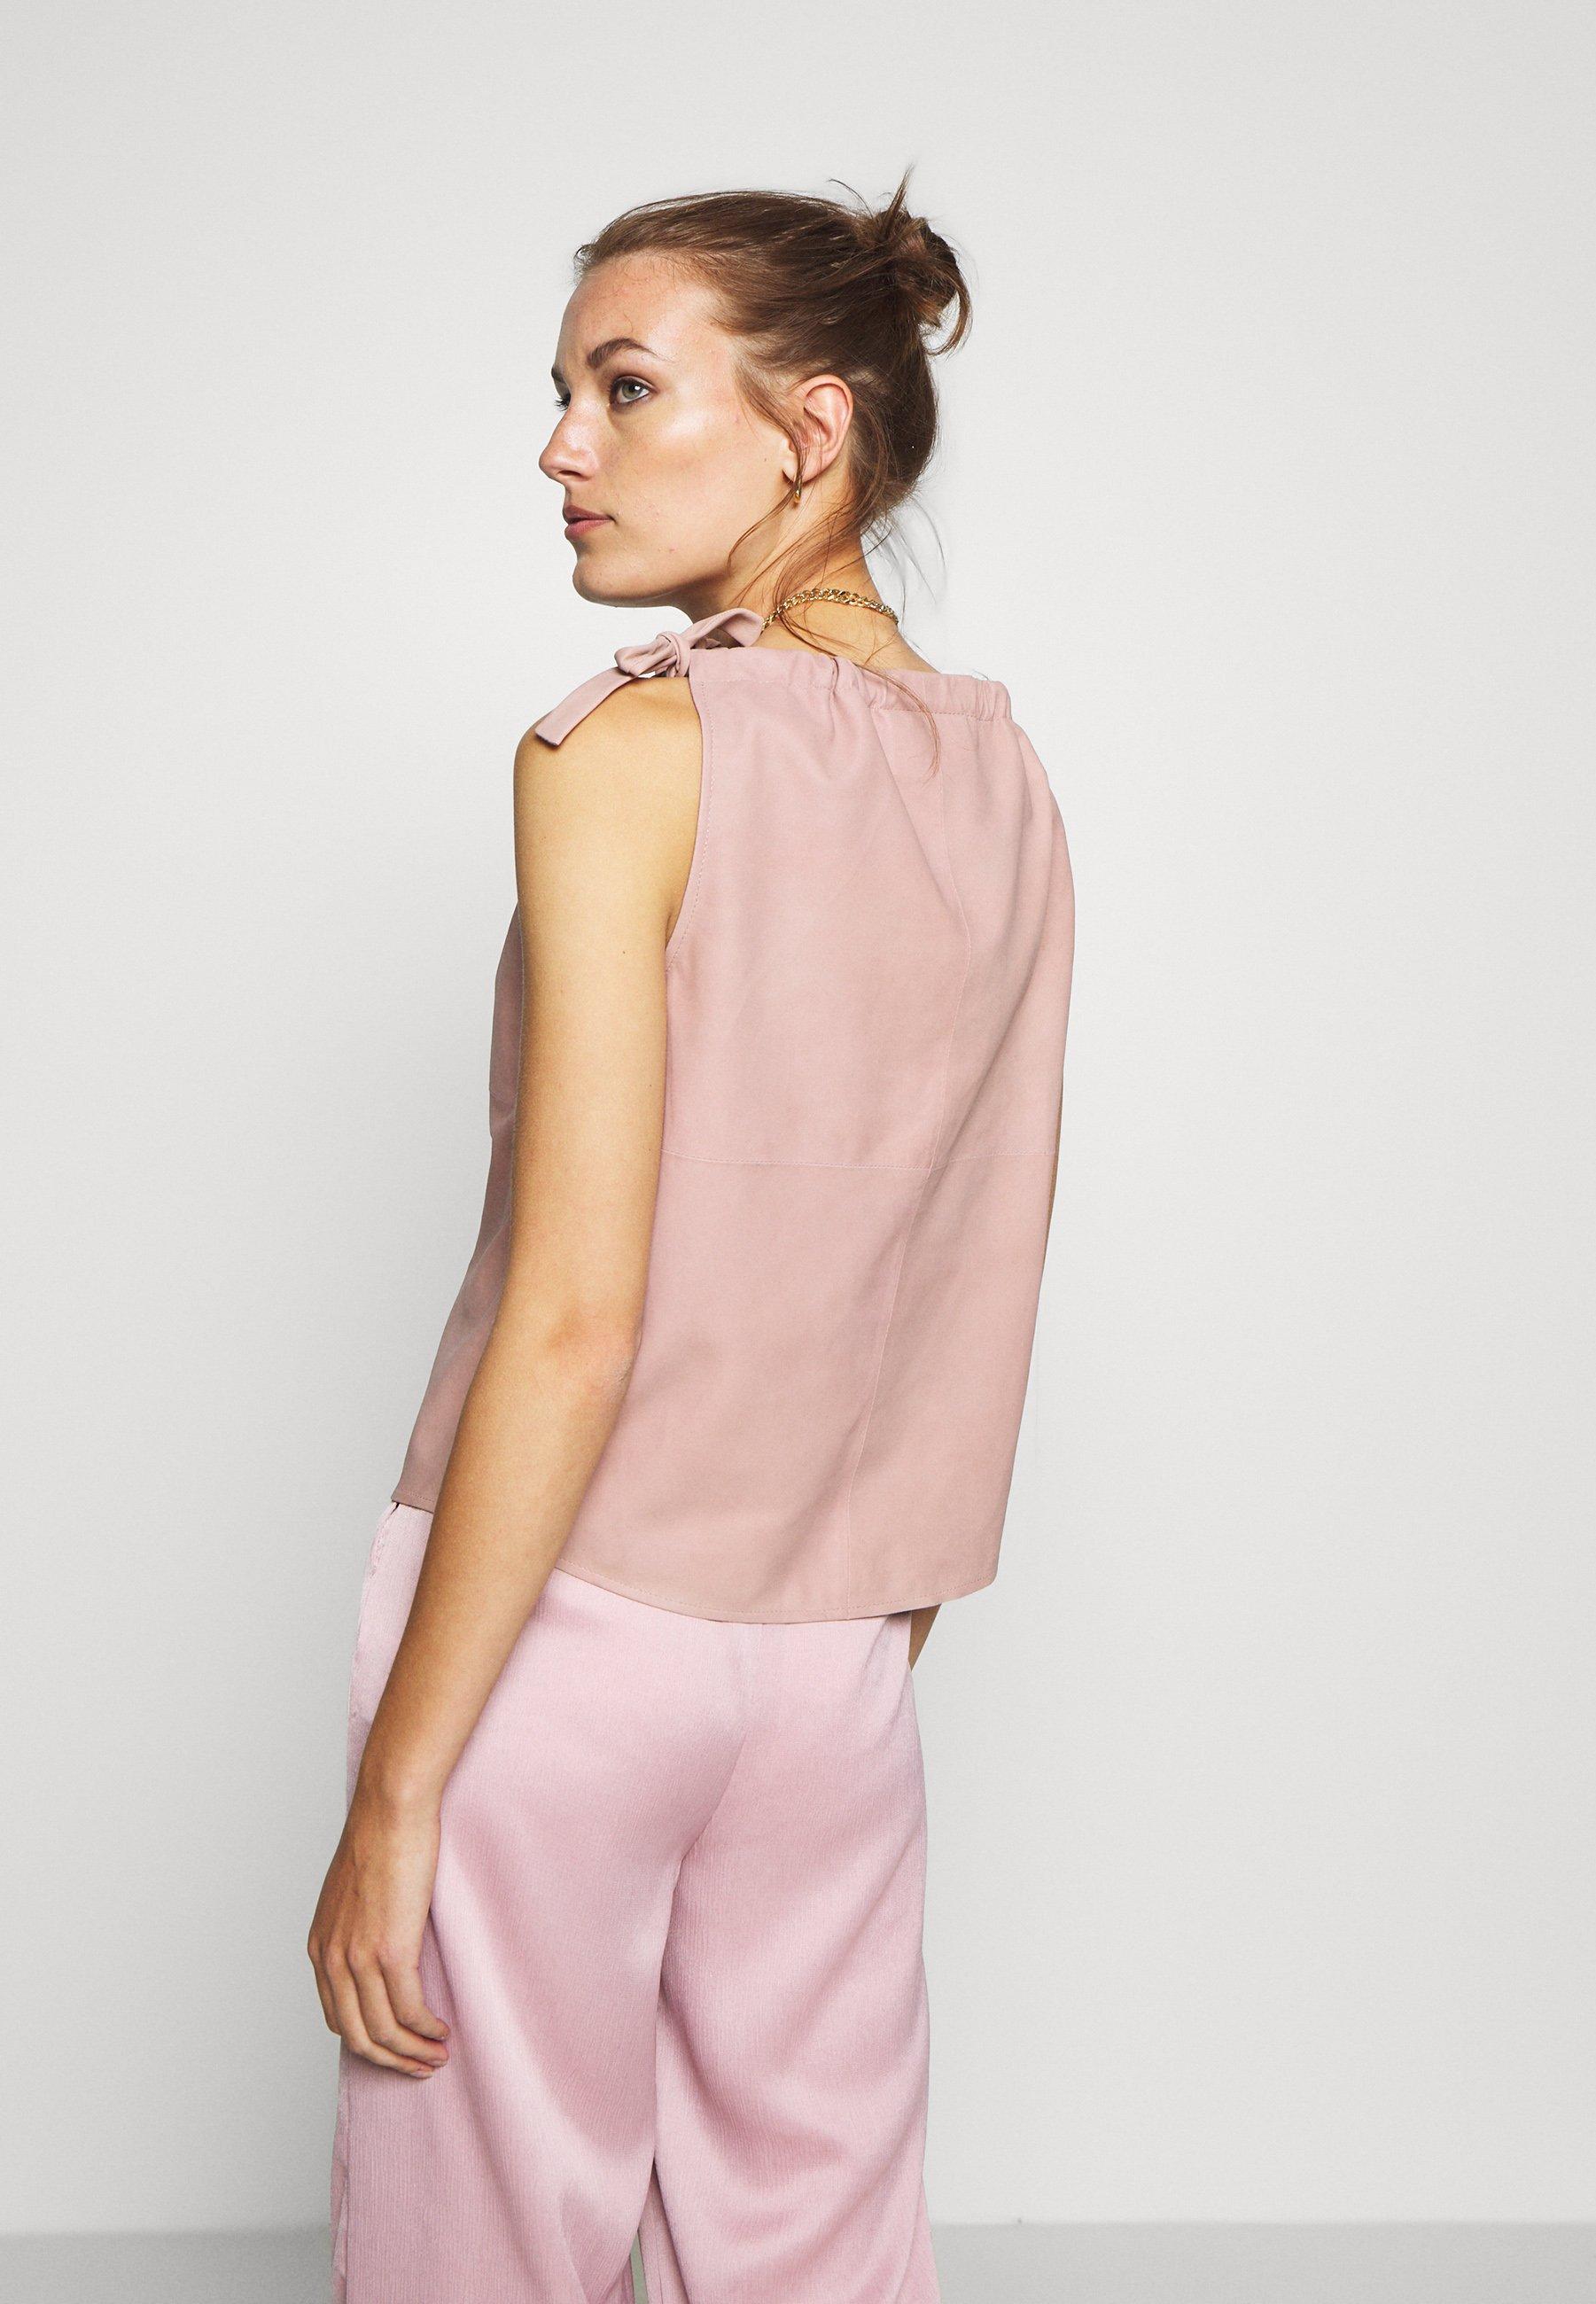 DEPECHE Blouse - dusty rose - Tops & T-shirts Femme PEcgD